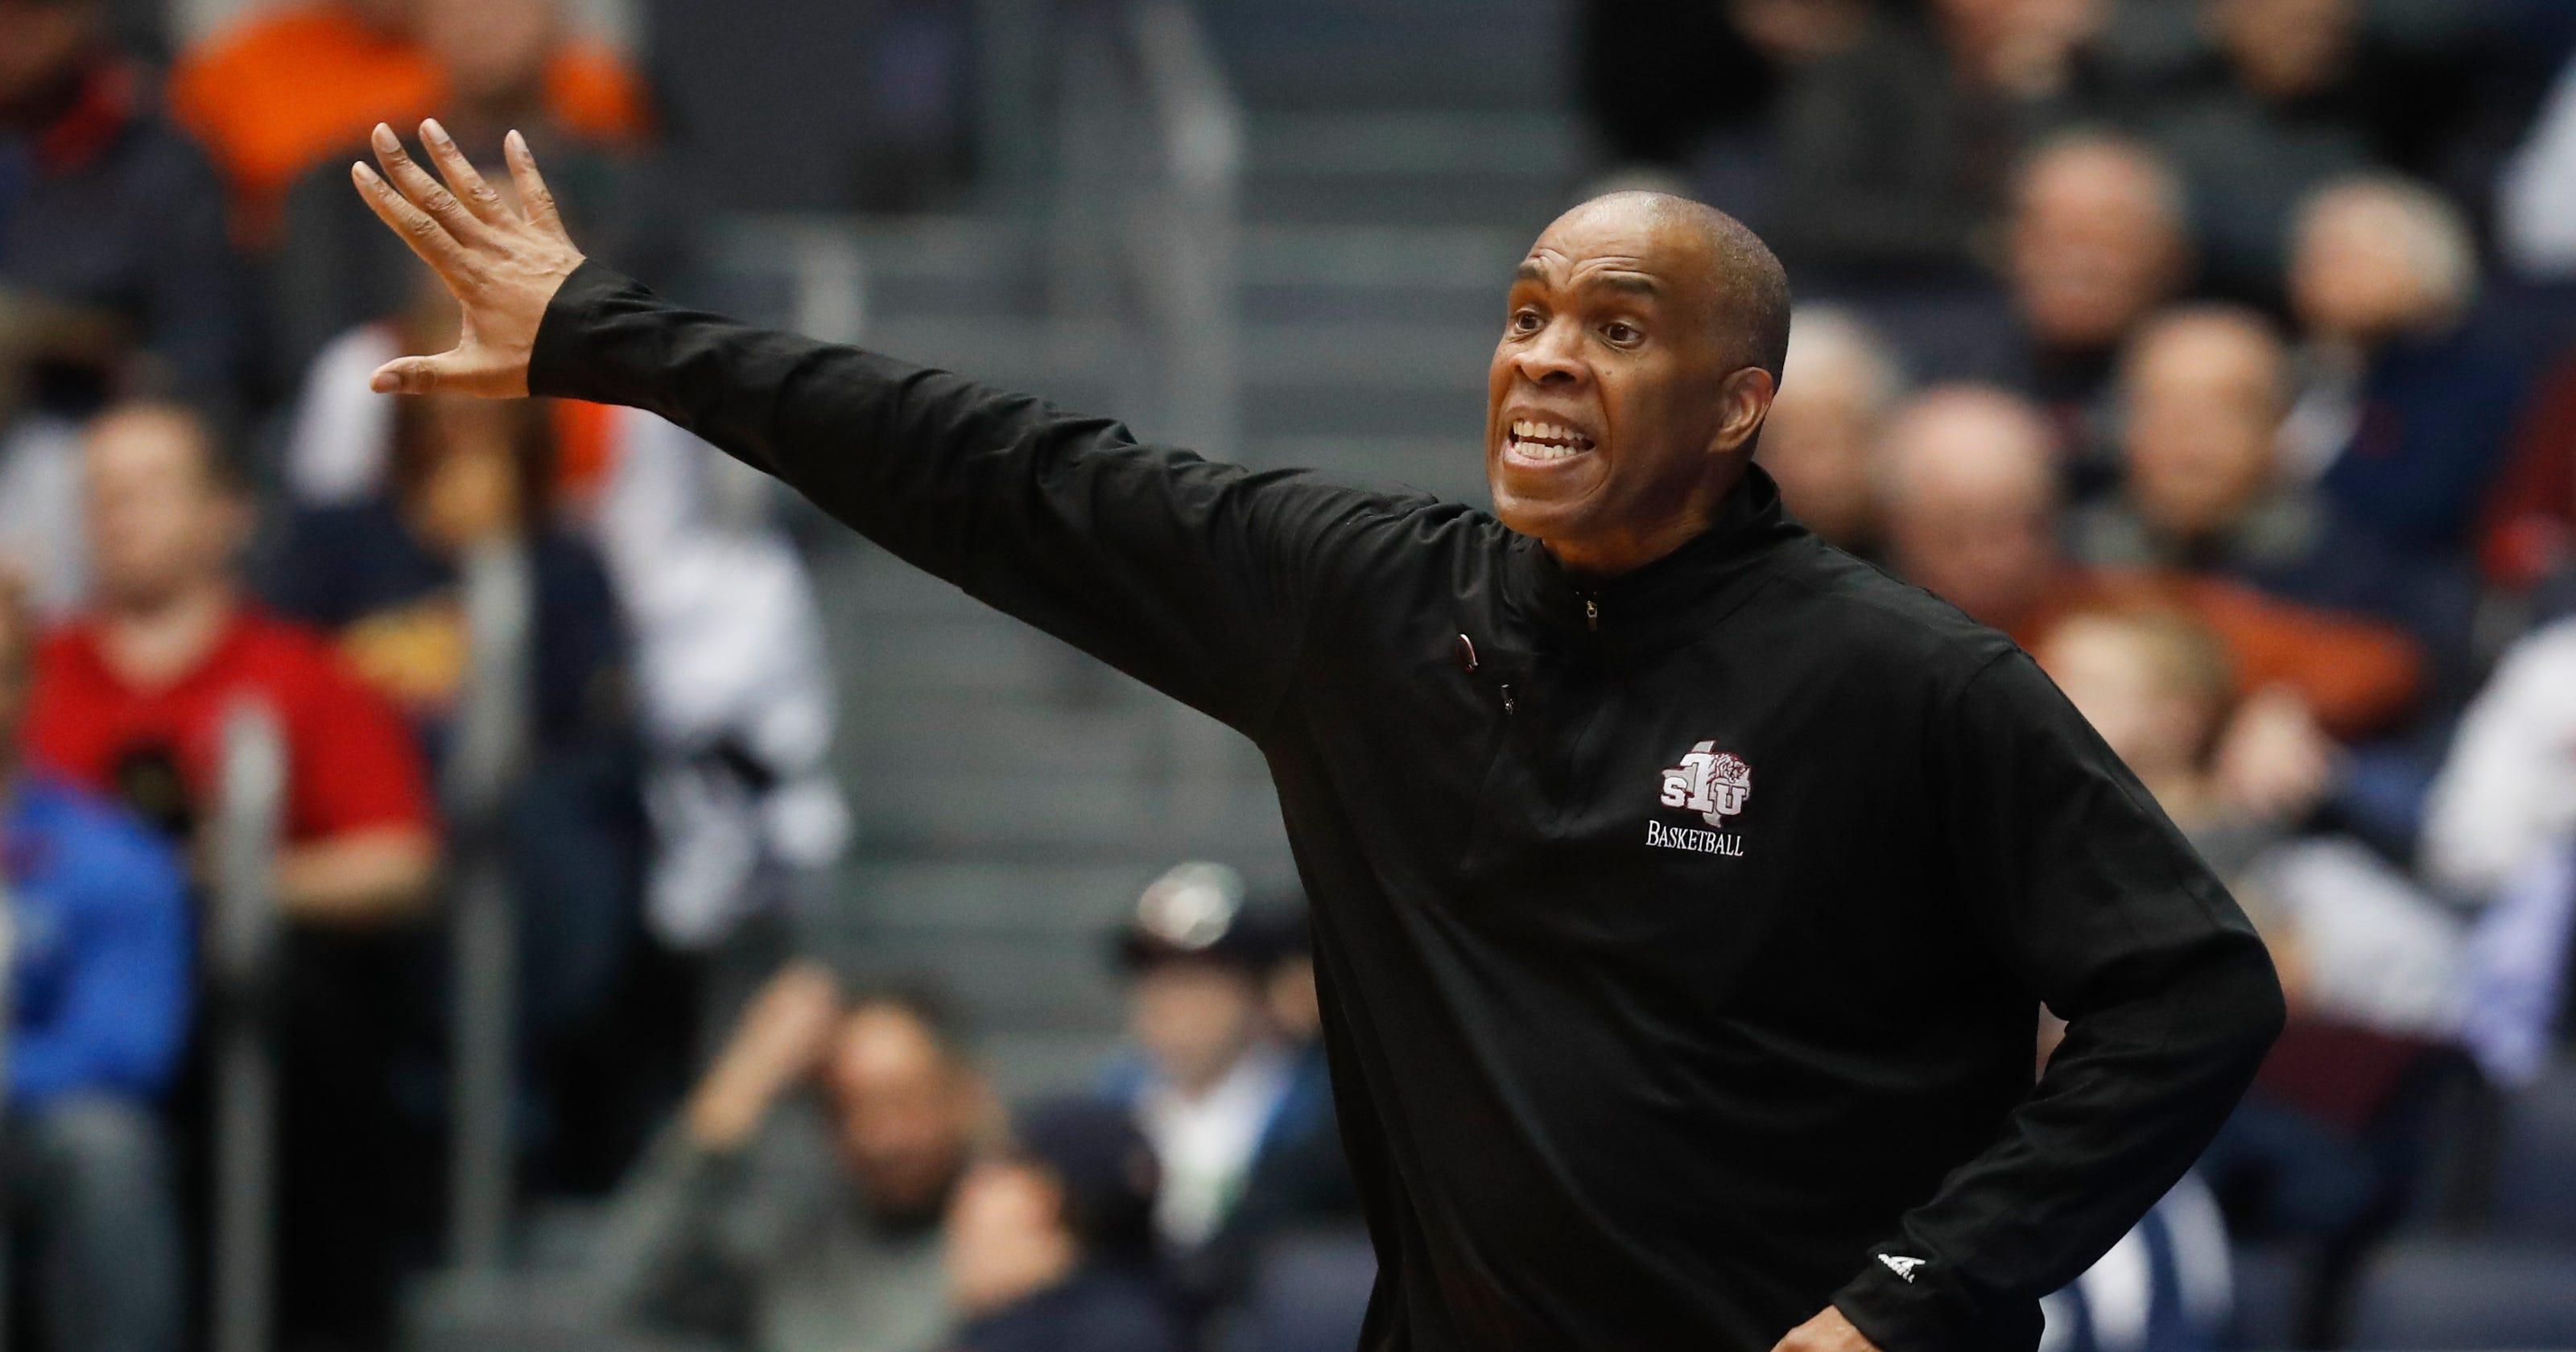 Dan Dakich expects turnaround from Detroit Mercy, Mike Davis